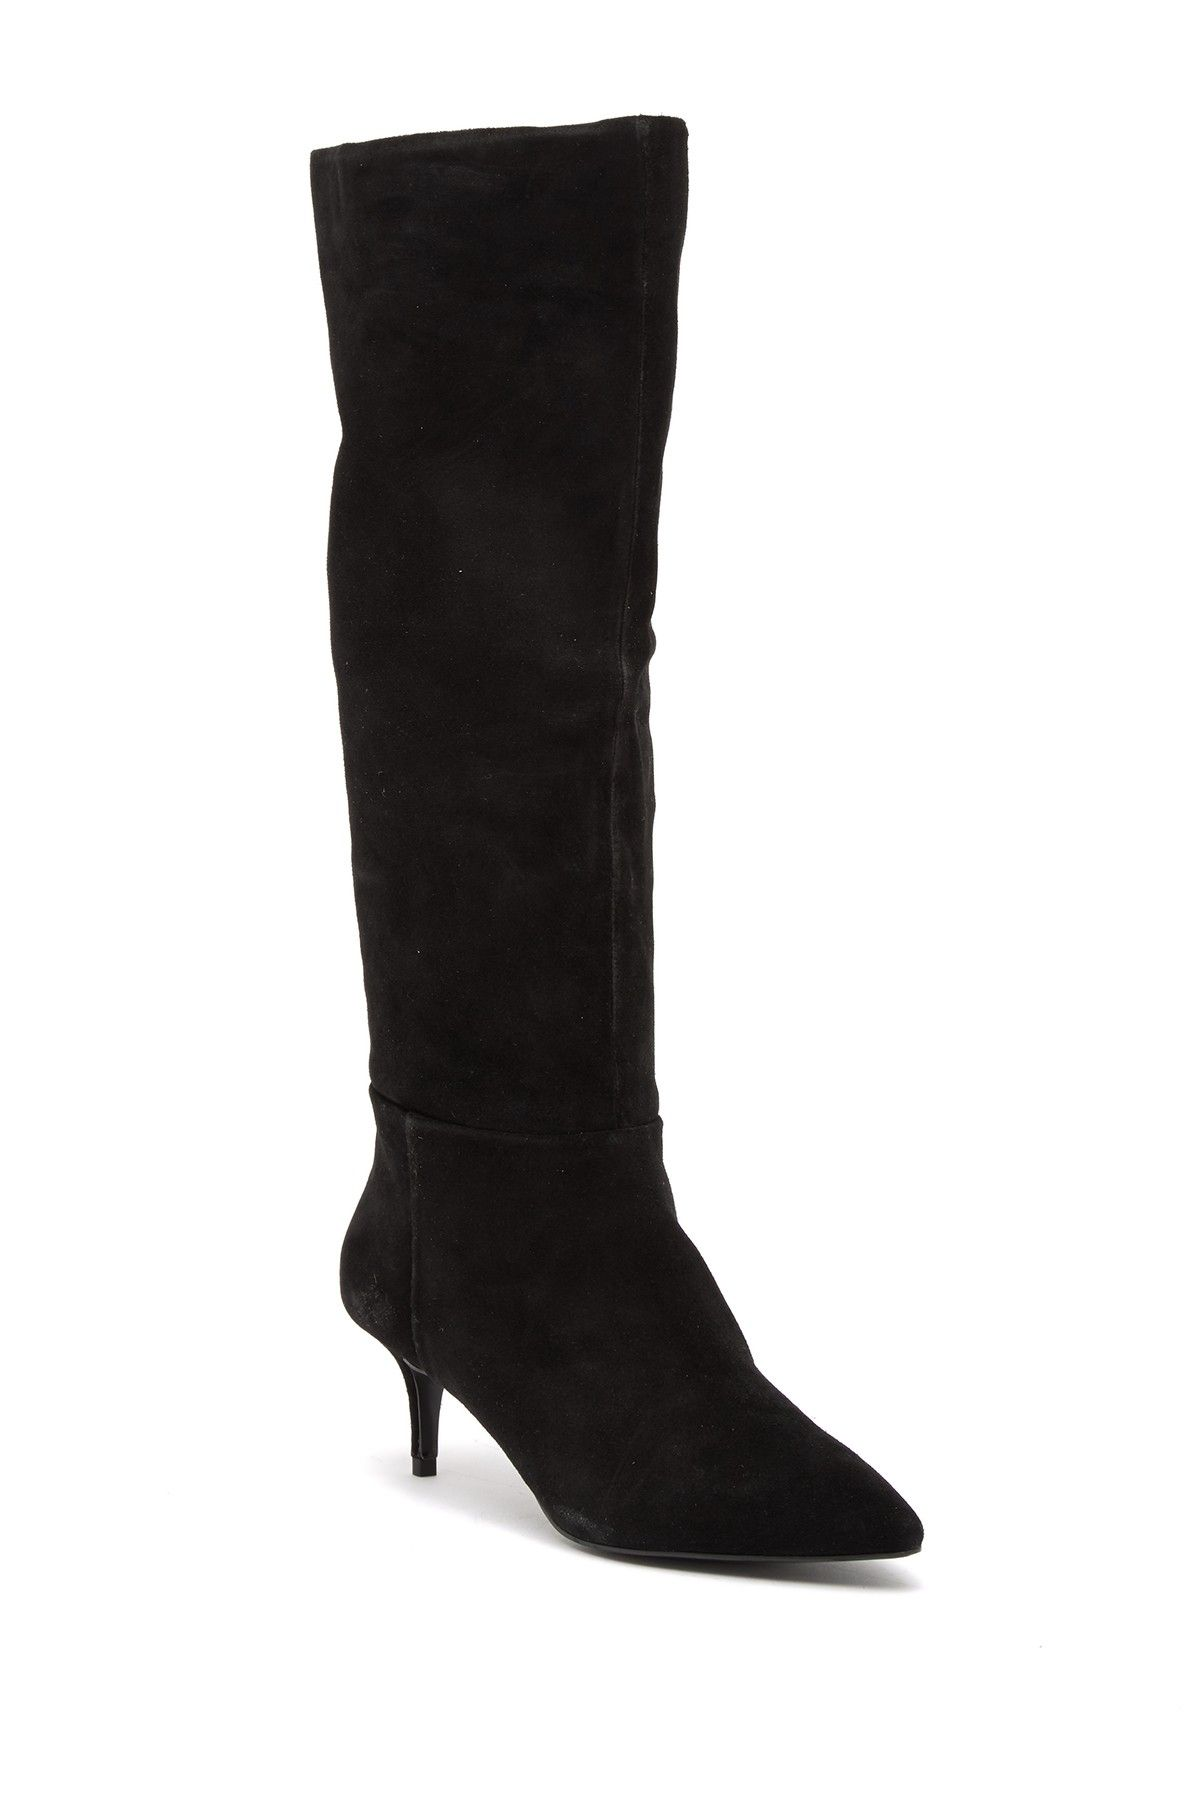 Steven By Steve Madden Kendrick Suede Kitten Heel Knee High Boot Nordstrom Rack Boots Heels High Boots